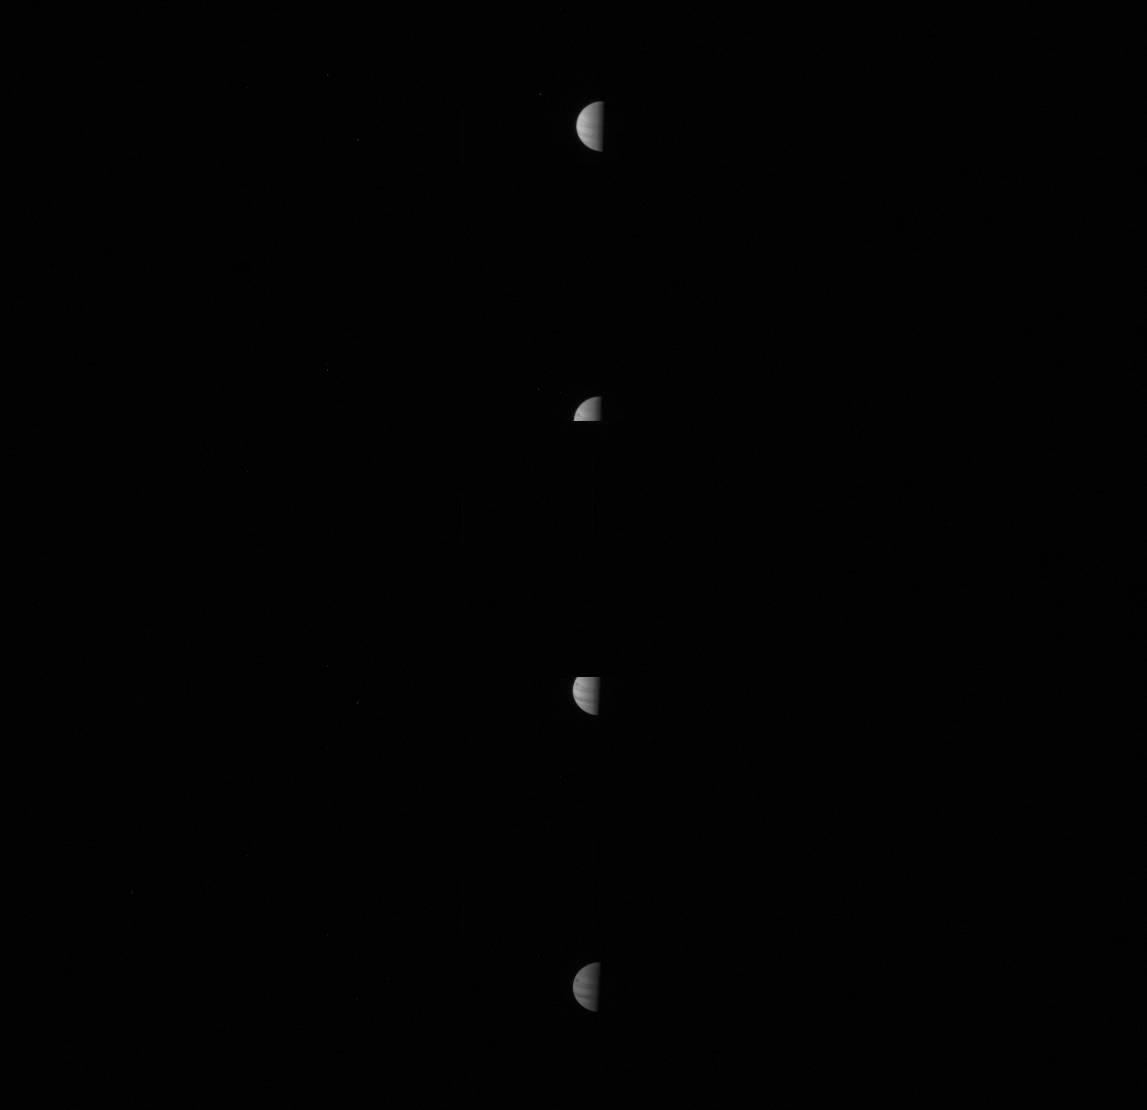 Juno image